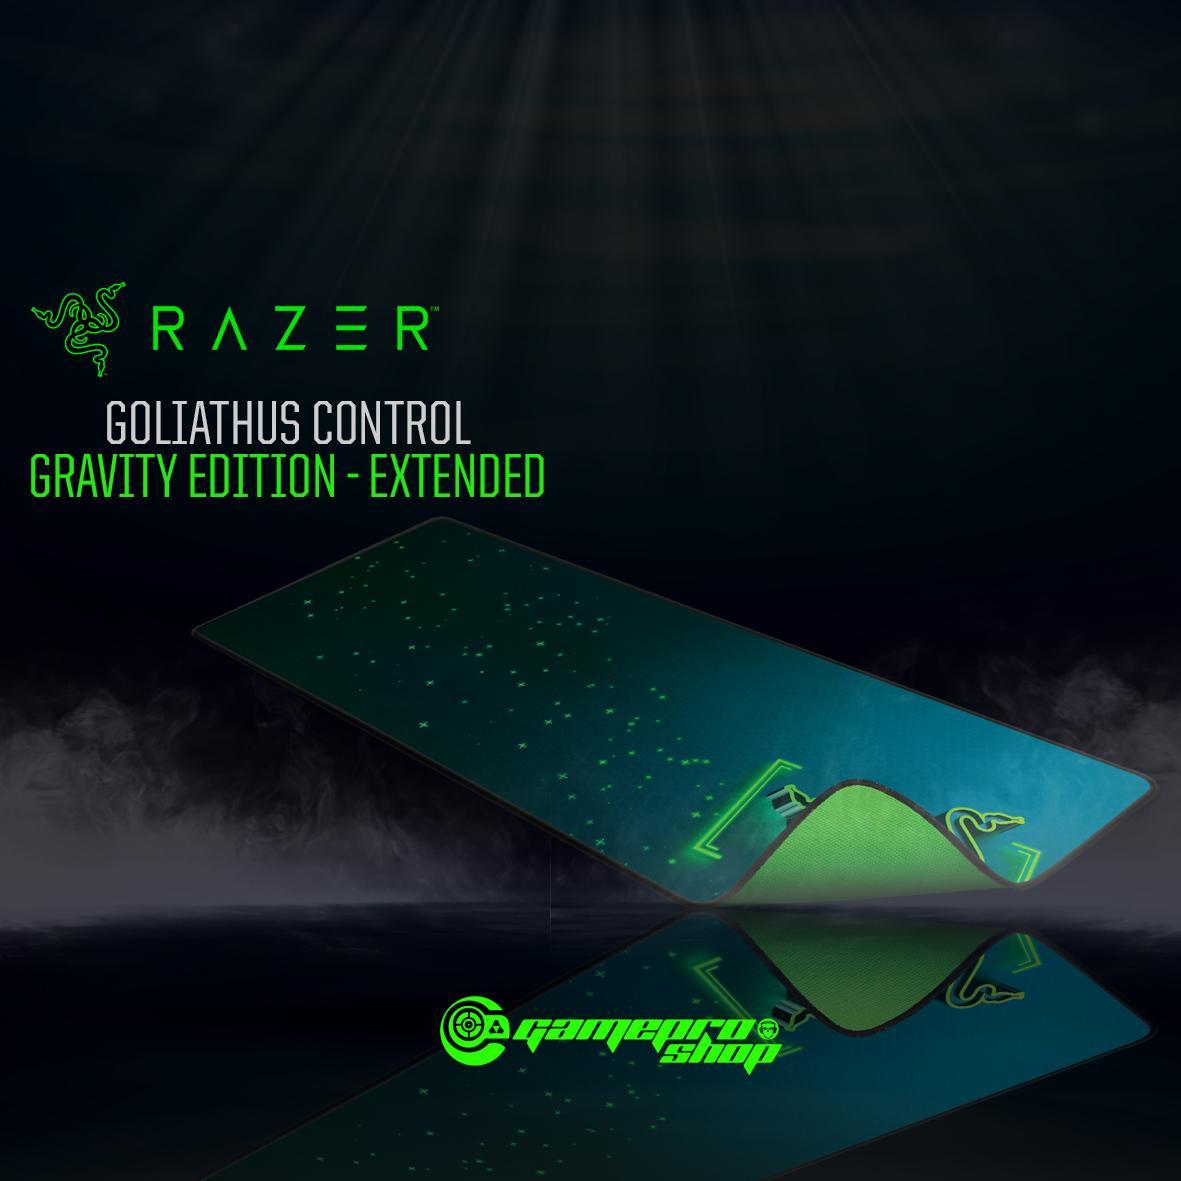 RAZER GOLIATHUS CONTROL GRAVITY EDITION - EXTENDED *COMEX PROMO*